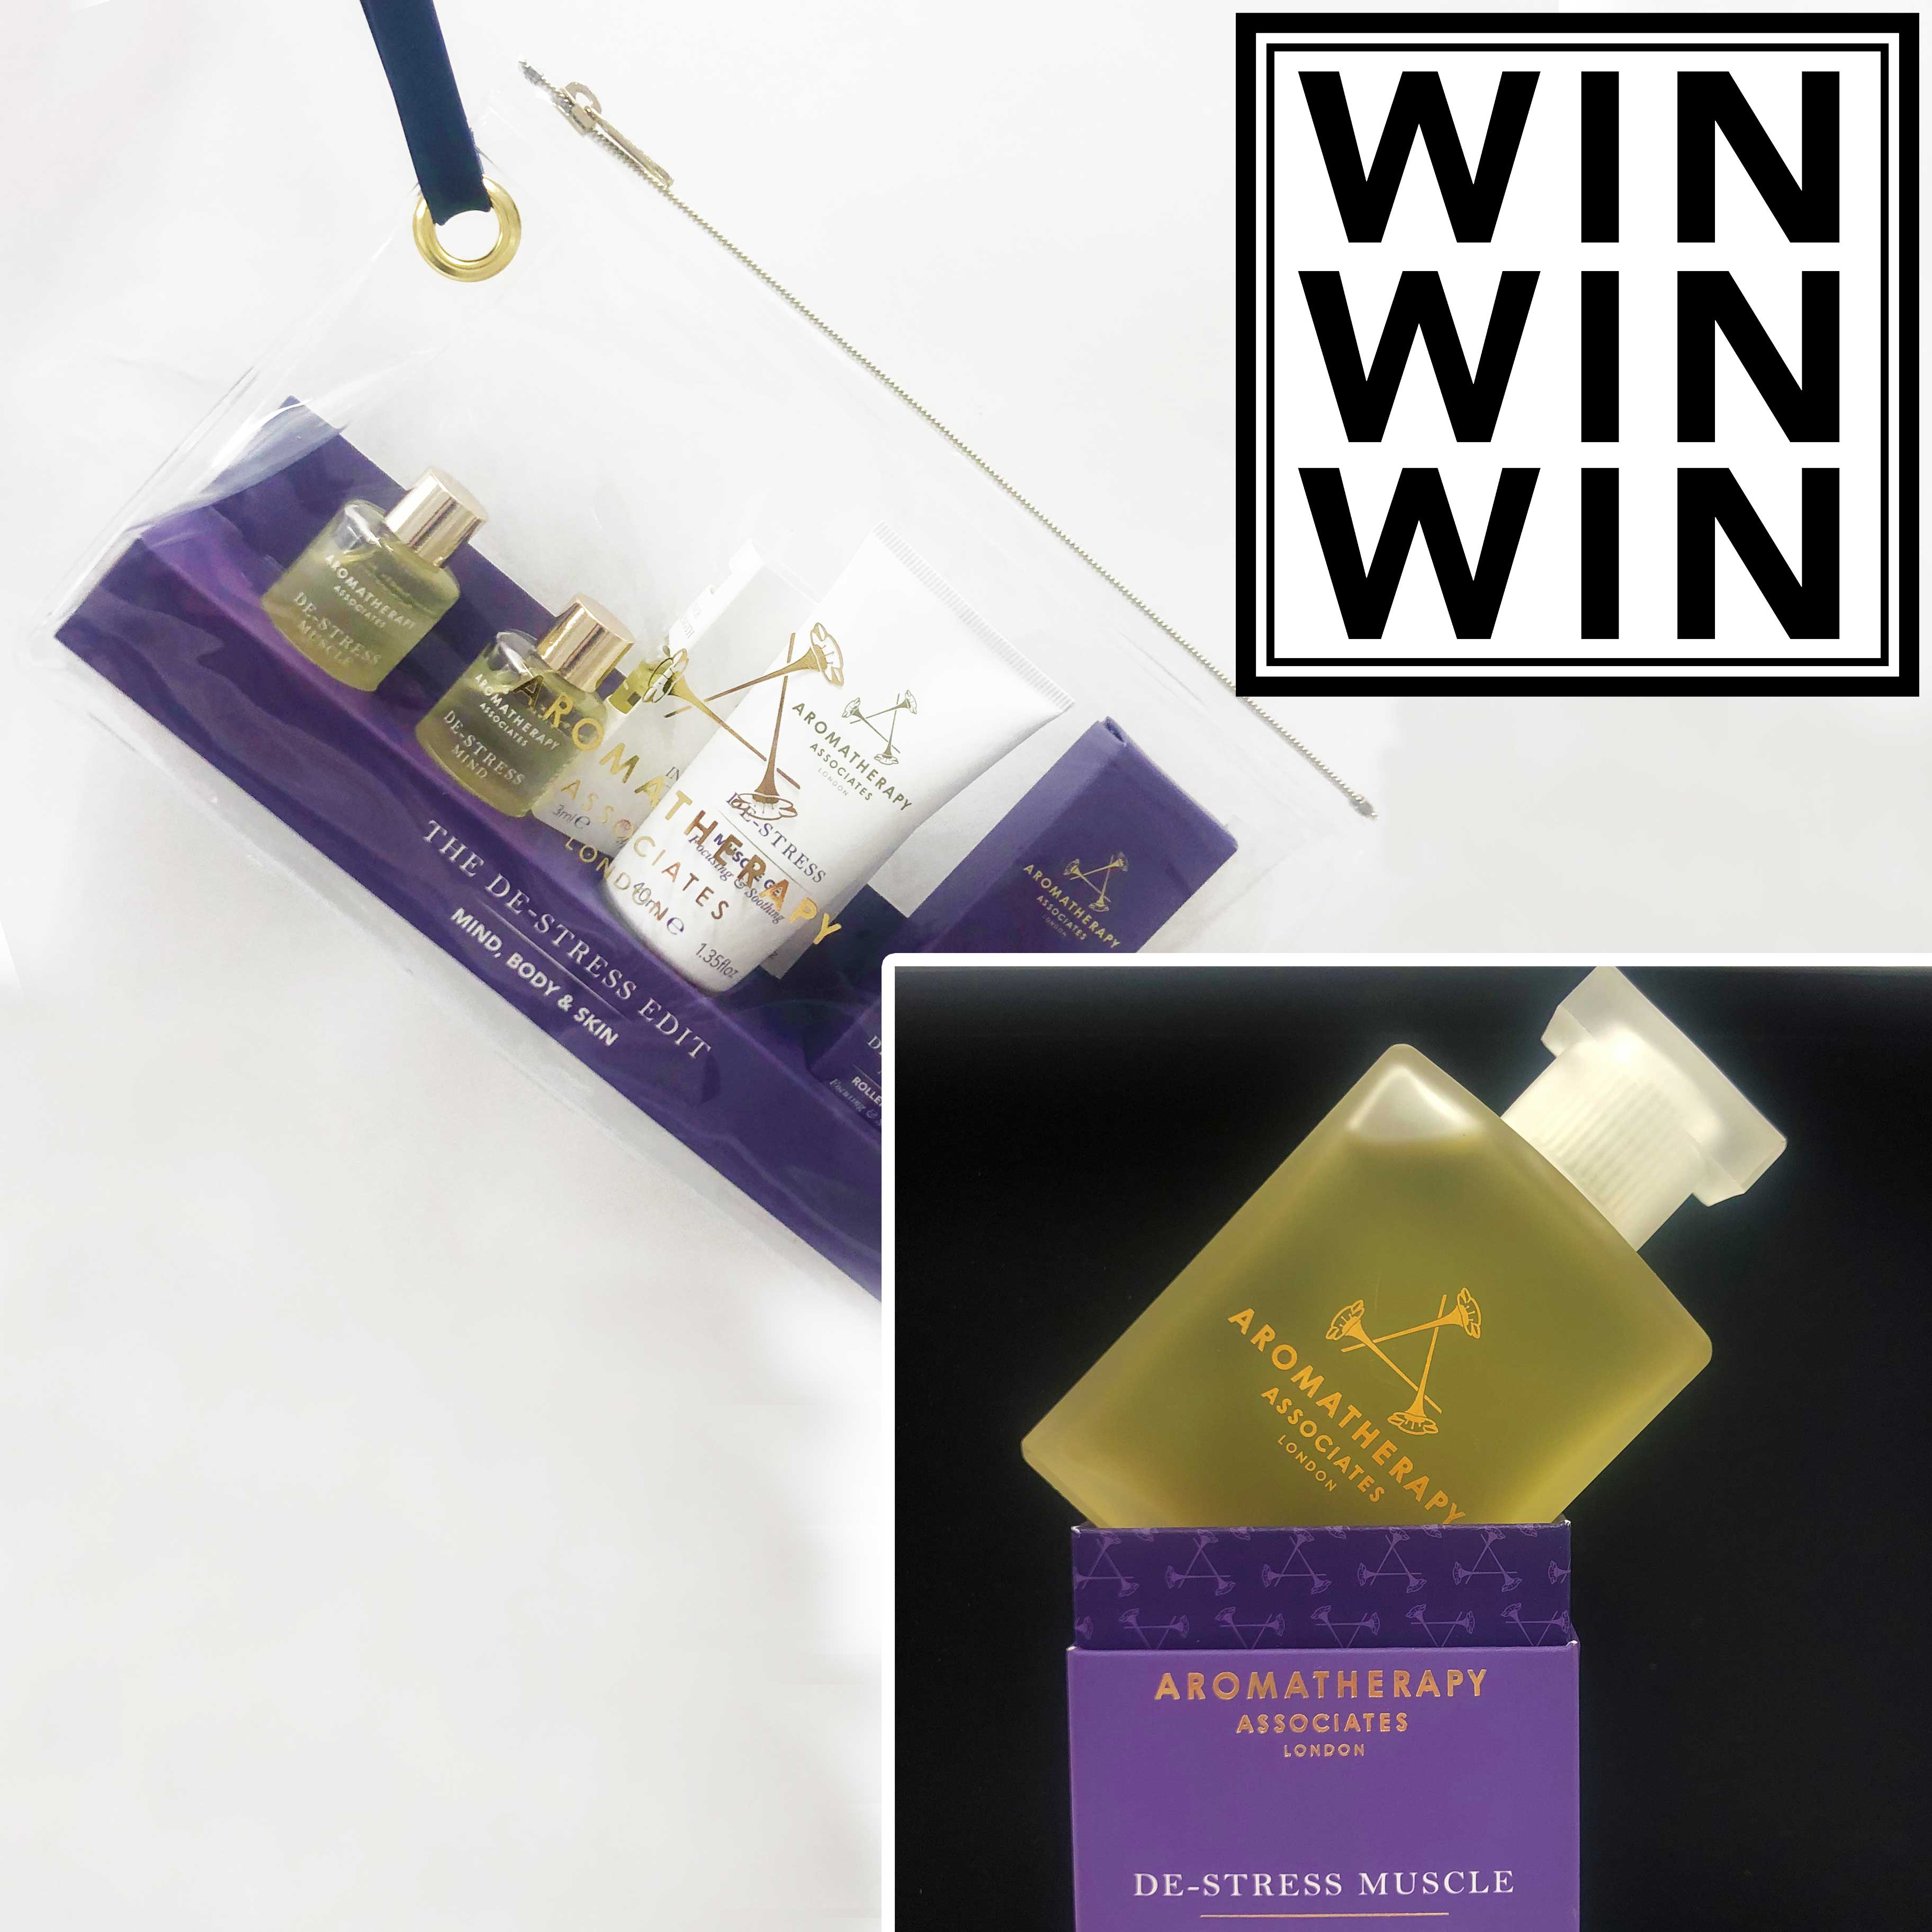 aromatherapy-associates-giveaway